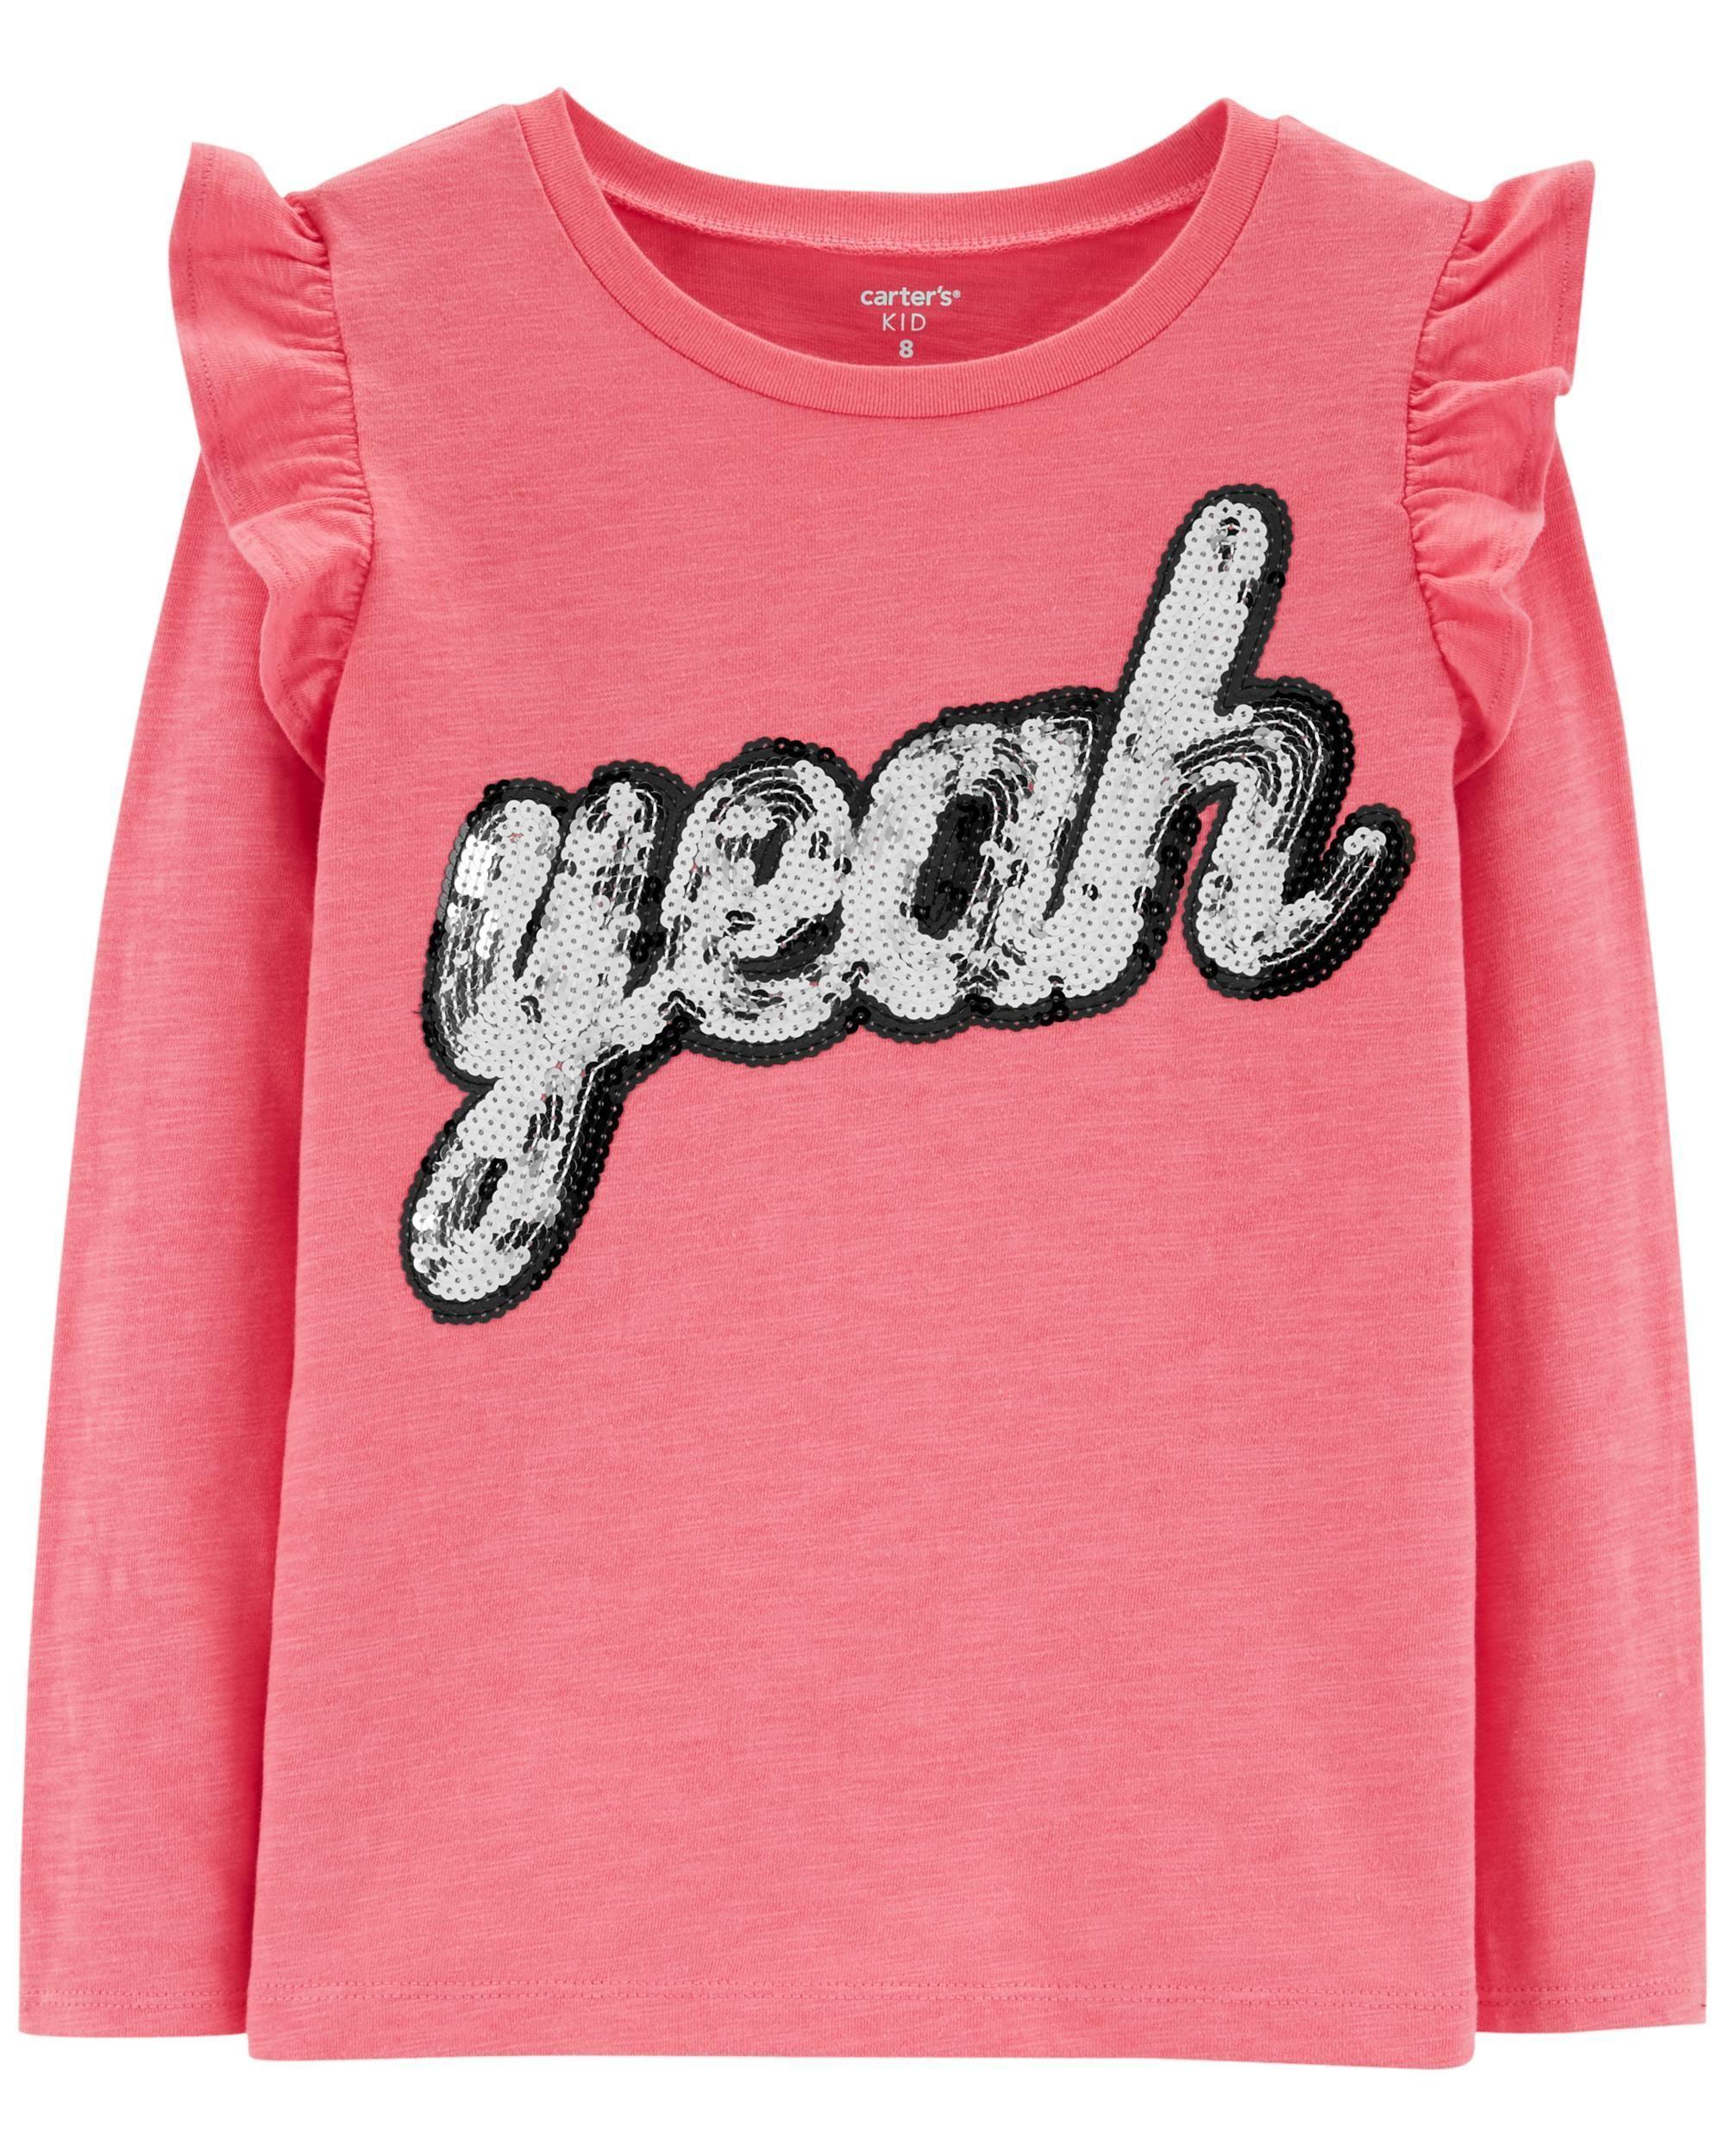 e7f9275b9 Sequin Slogan Slub Top | Wear It | Kids girls tops, Tops, Carter kids